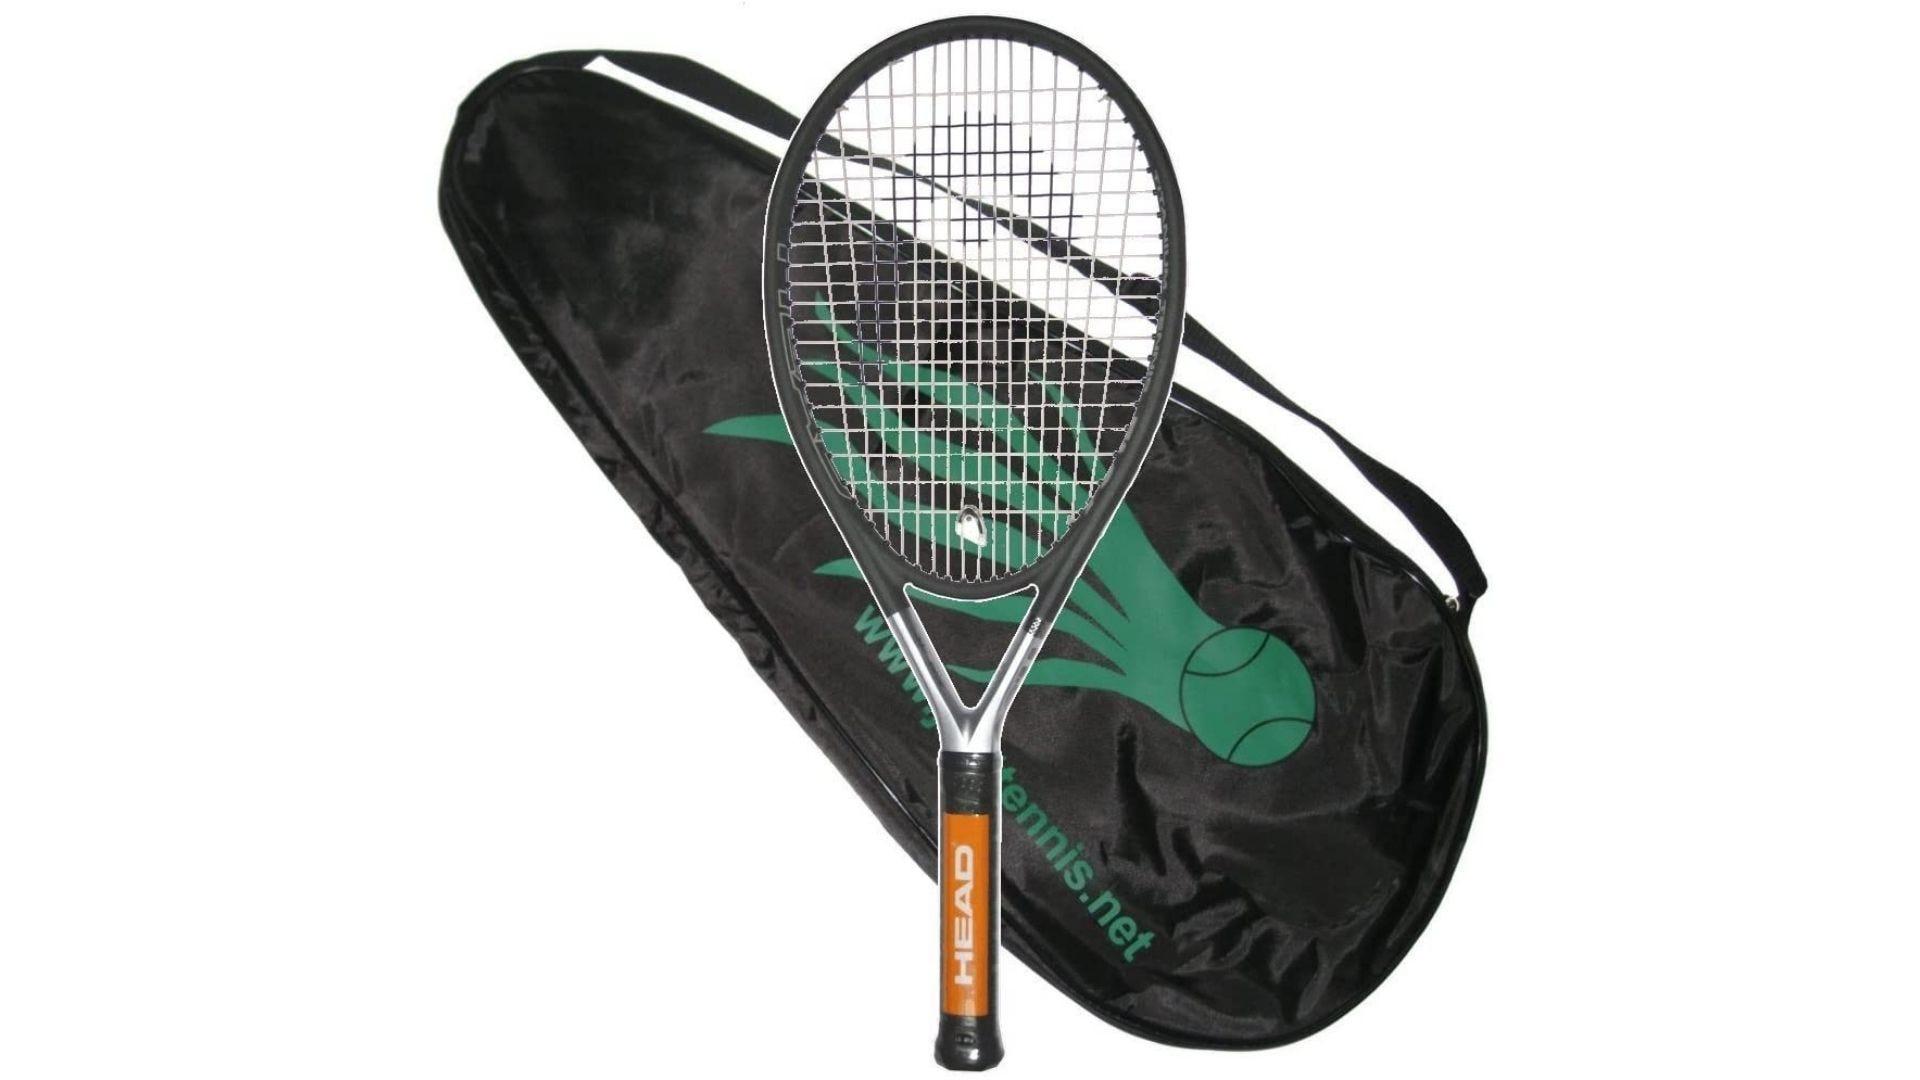 The HEAD Ti.S6 tennis racquet and bag.